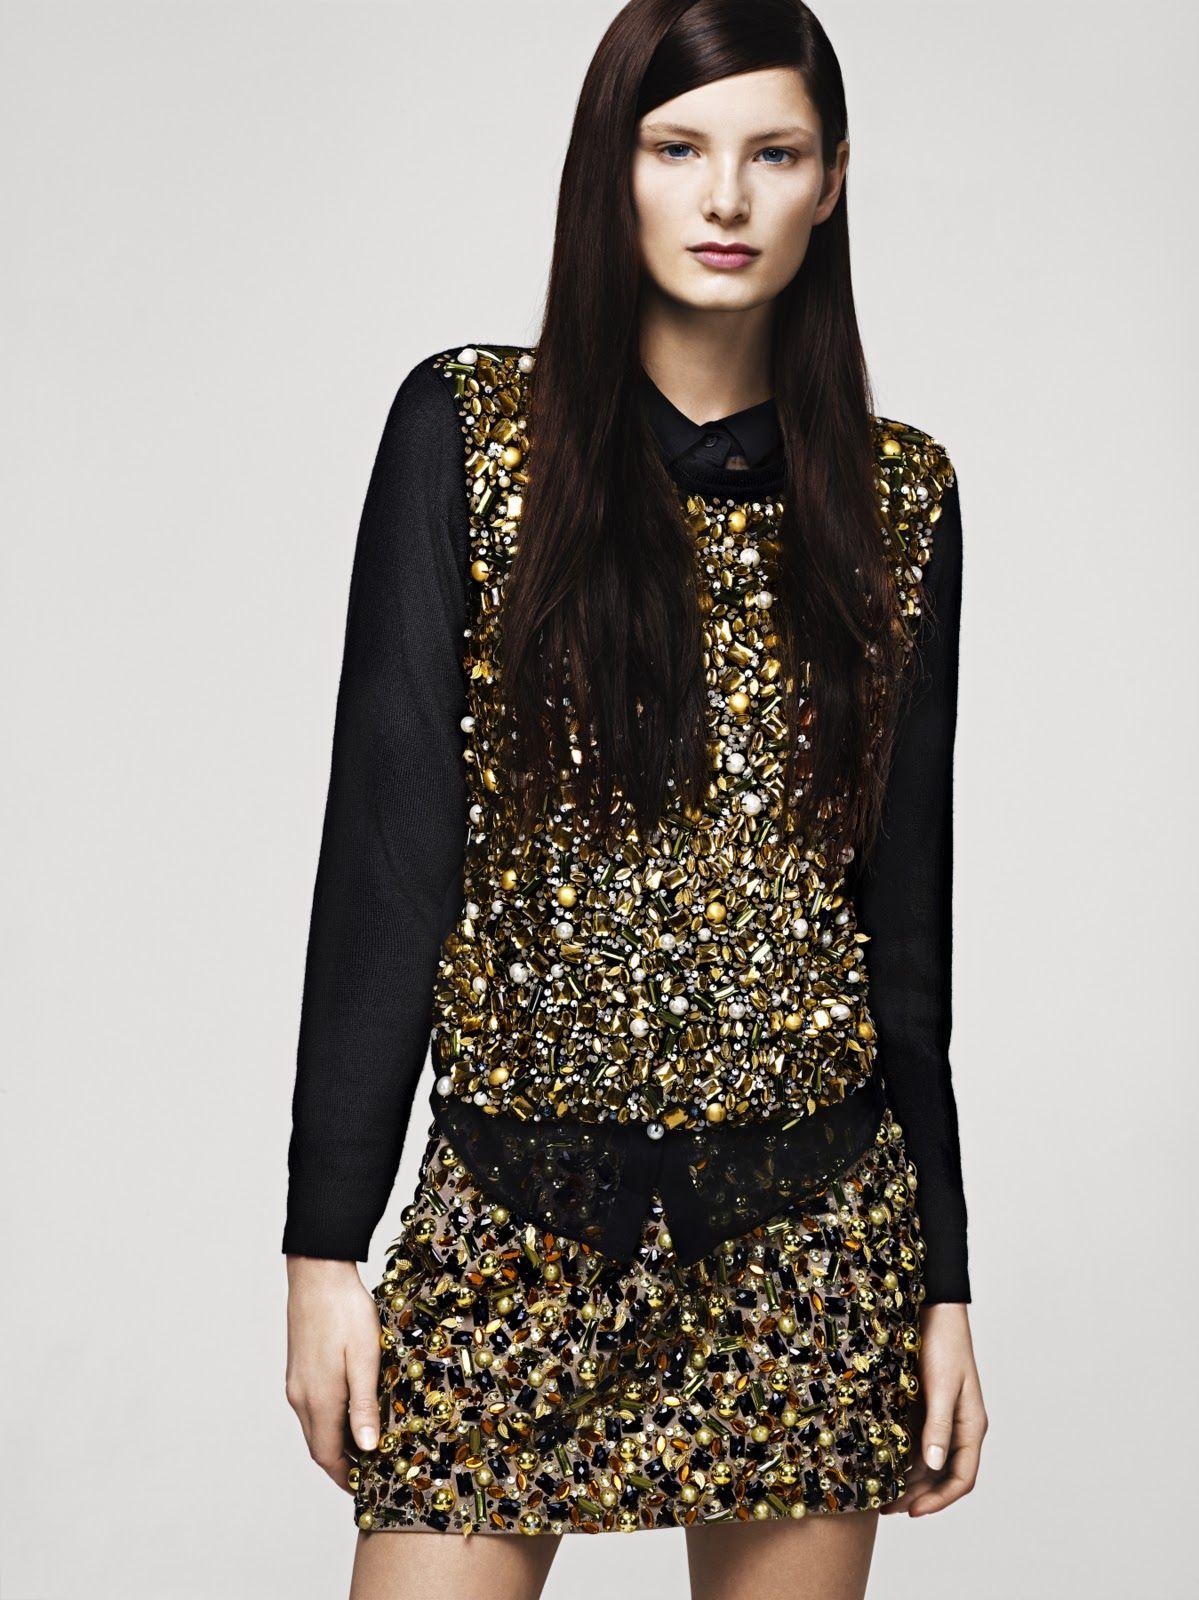 #Gold #Glitter #Model #Editorial #Campaign #HM #Black #Holidays #Style #Fashion #BiographyInspiration